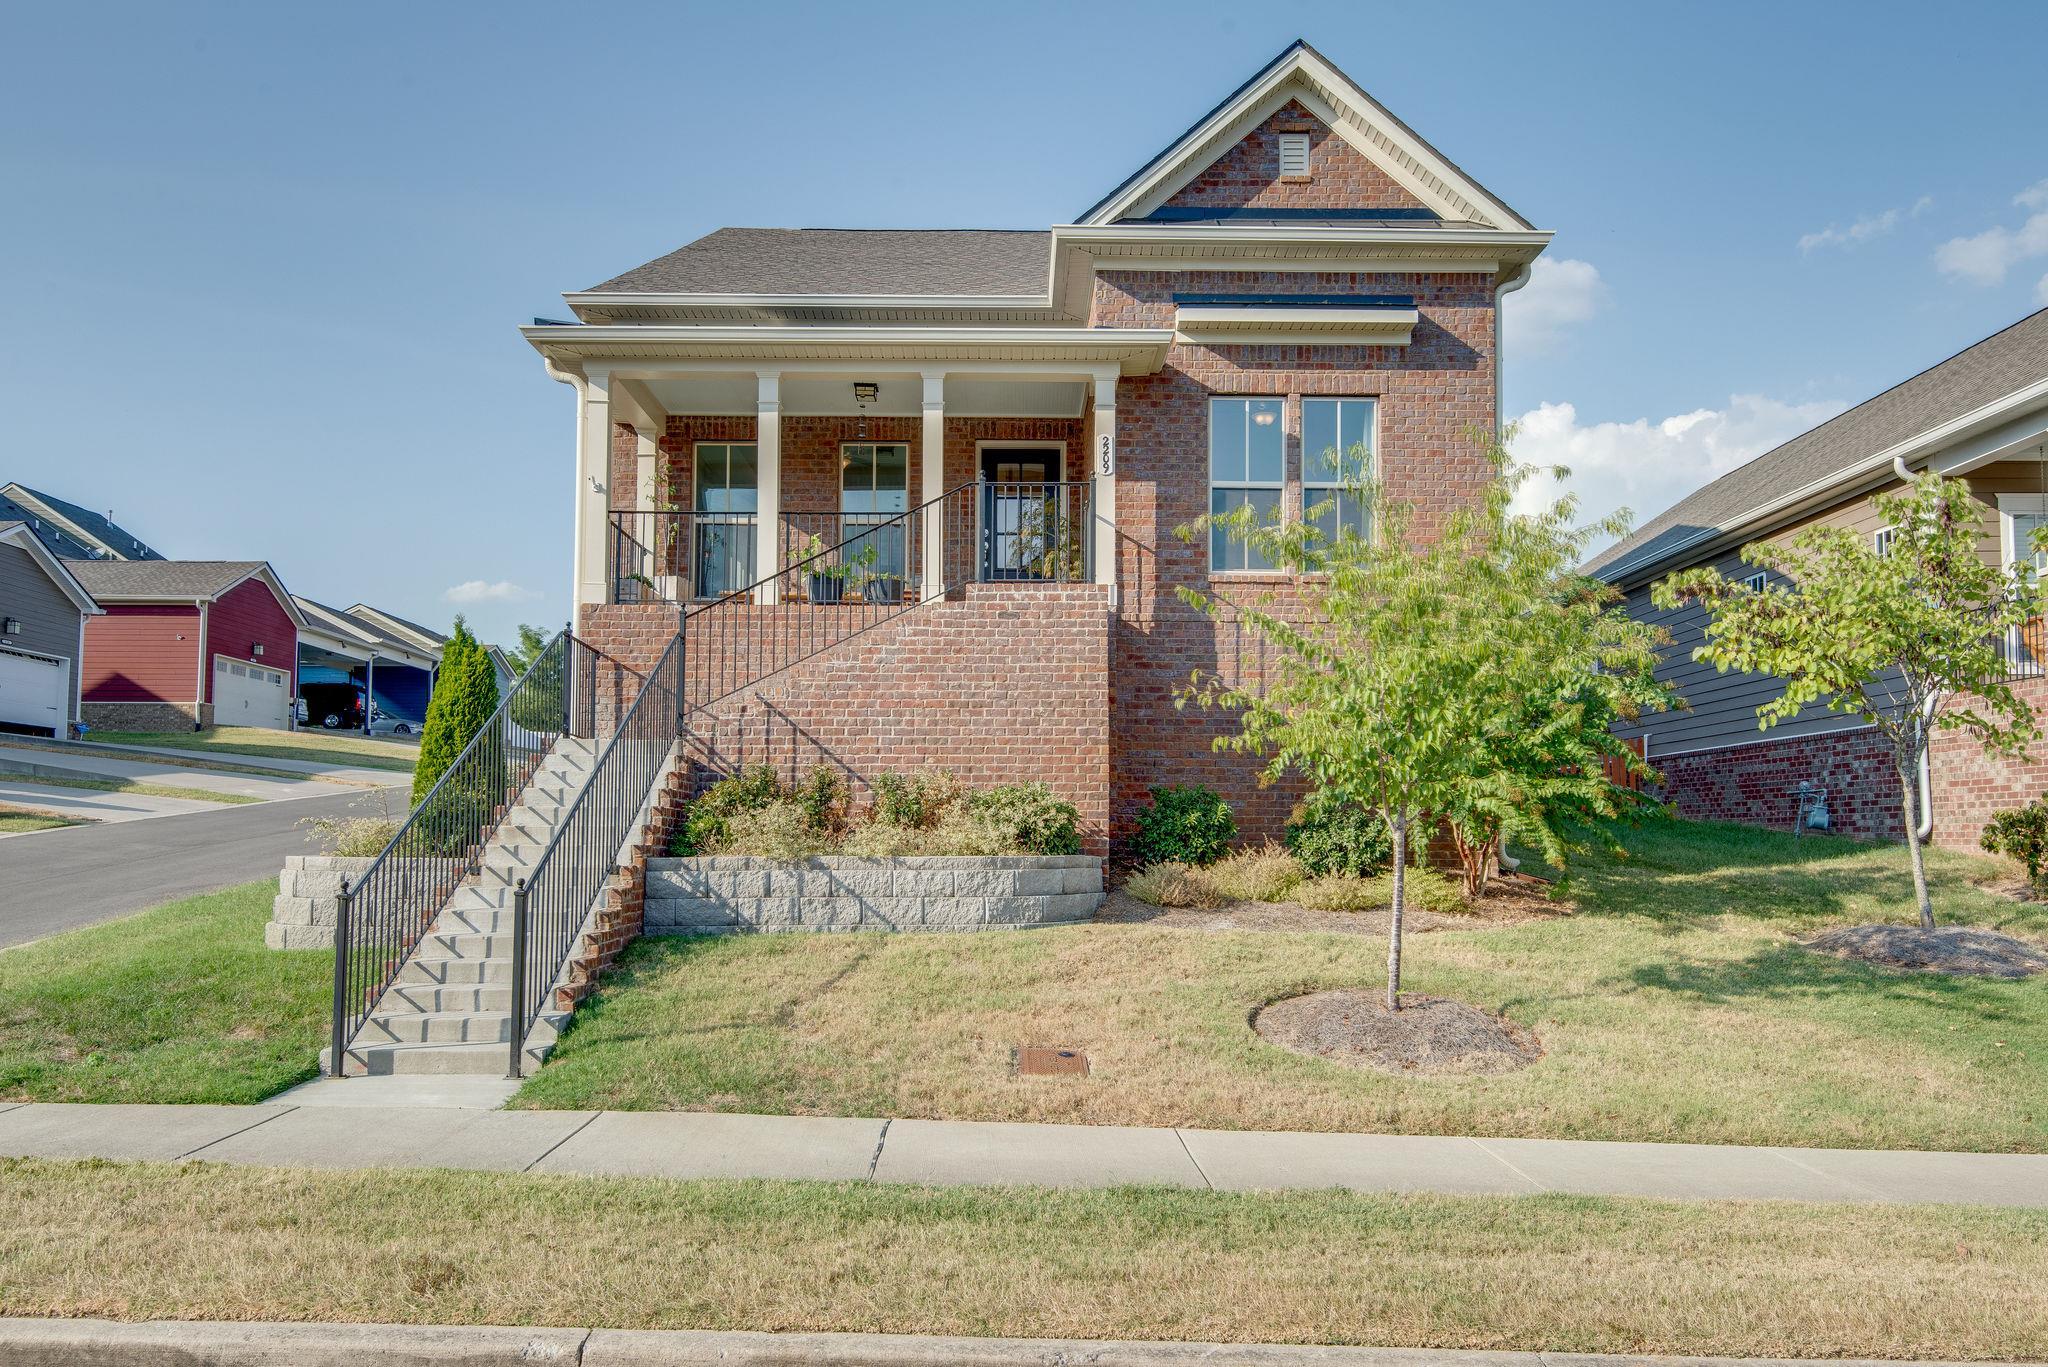 2209 Vineyard Garden Ln, Nolensville, TN 37135 - Nolensville, TN real estate listing